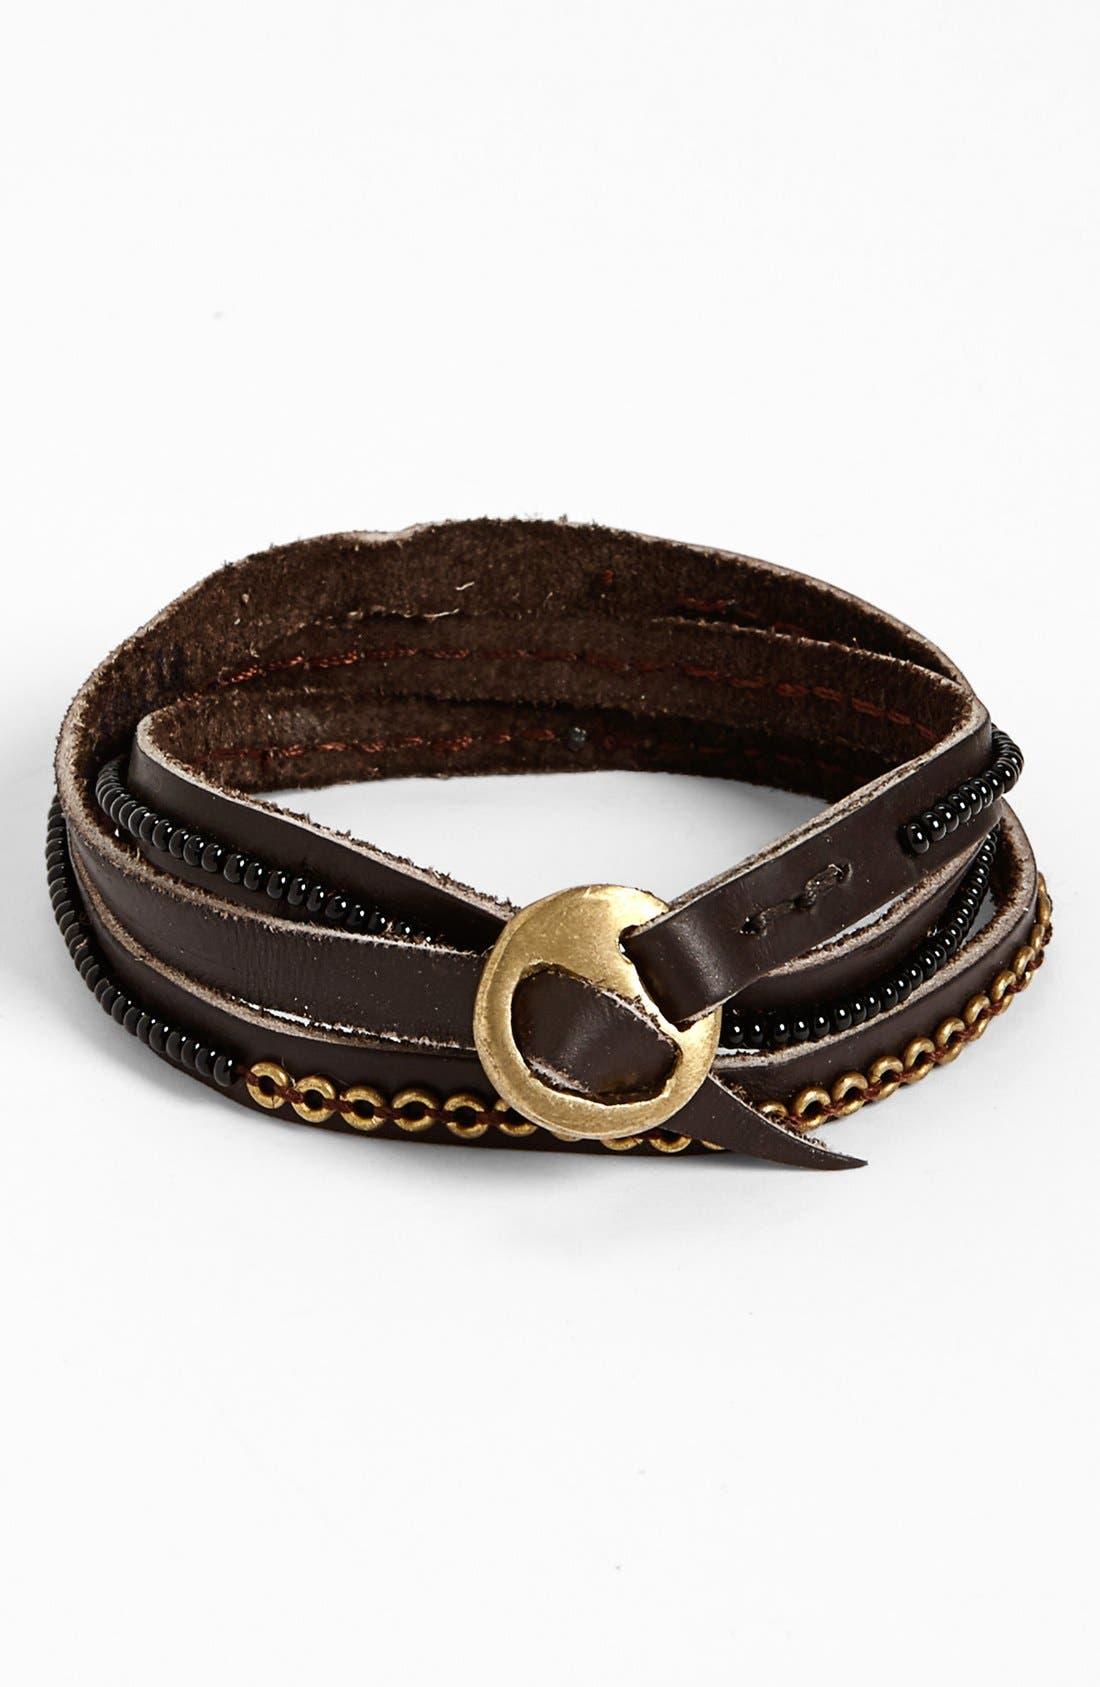 Alternate Image 1 Selected - Me to We Artisans 'Tatu' Beaded Leather Wrap Bracelet (Juniors)